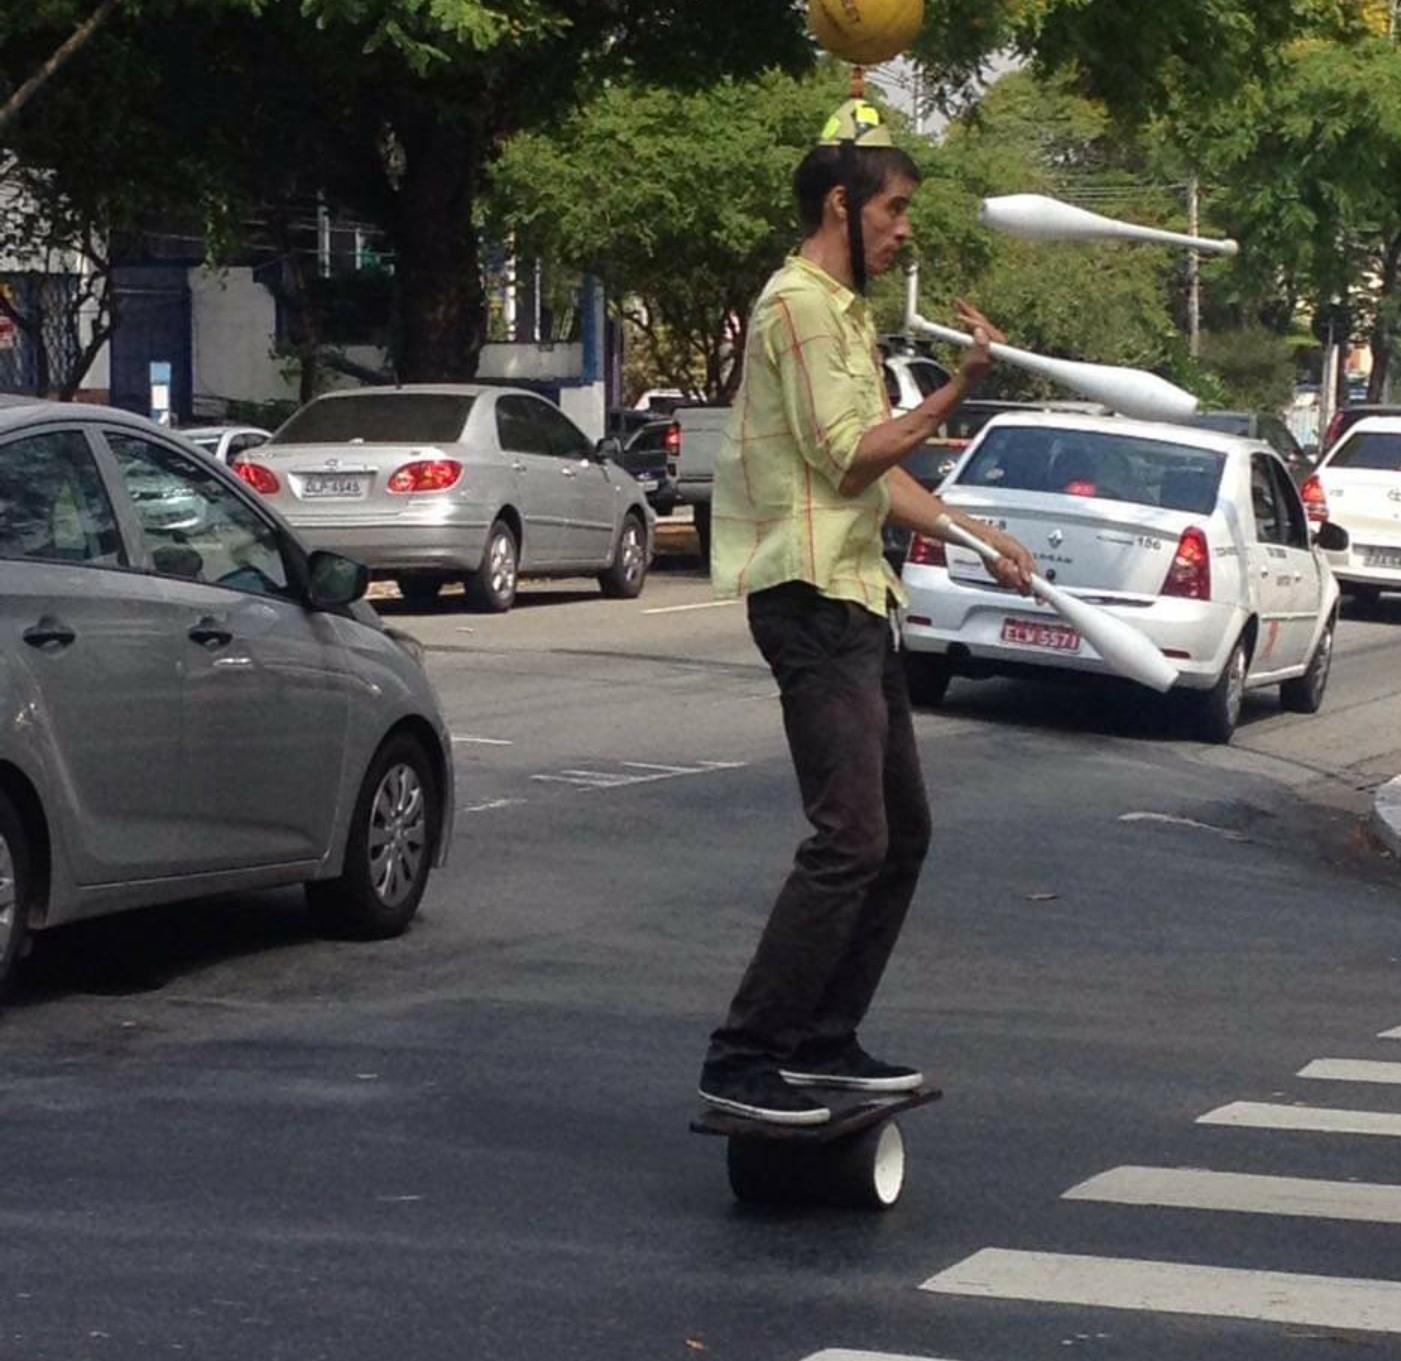 juggiling in street